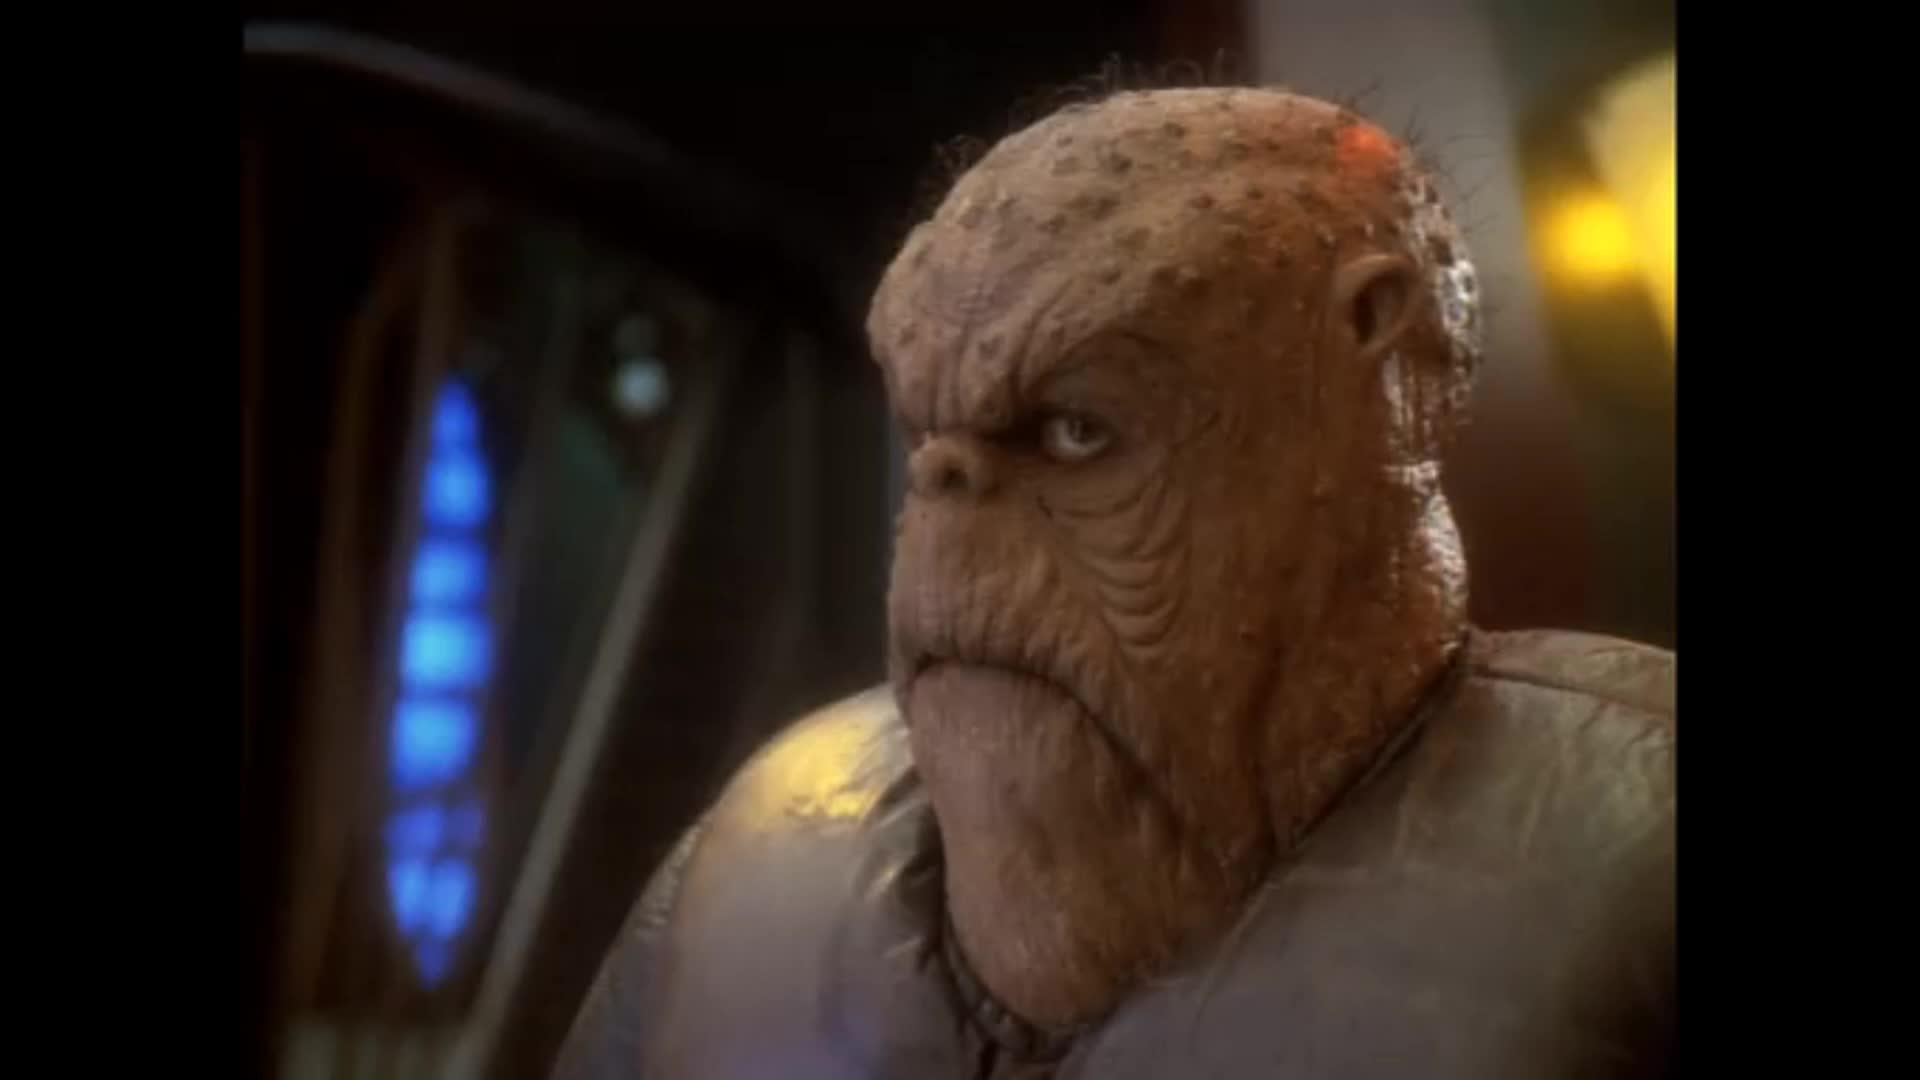 DS9, Deep Space Nine, Morn, Reaction, Star Trek, Star Trek Deep Space Nine, Who Mourns For Morn?, MornNod GIFs